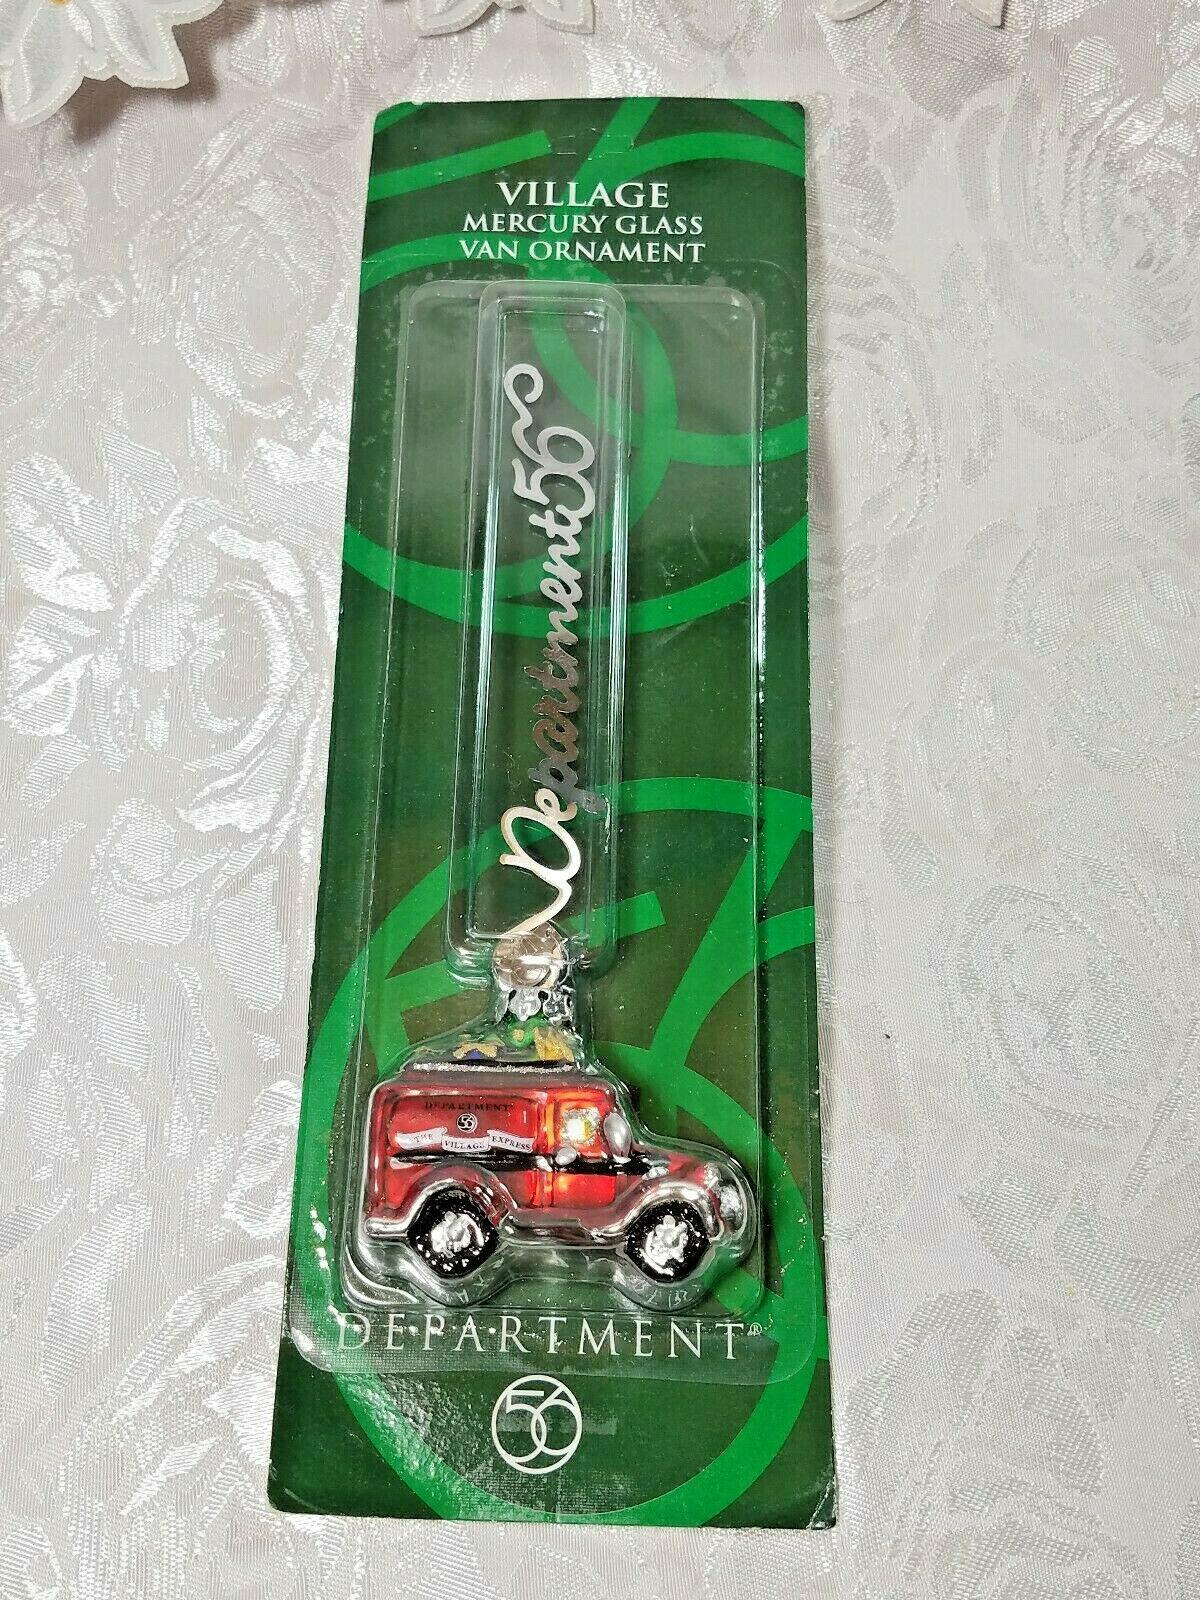 Dept 56 Village Mercury Glass Ornament Red Village Express Van NEW 2001